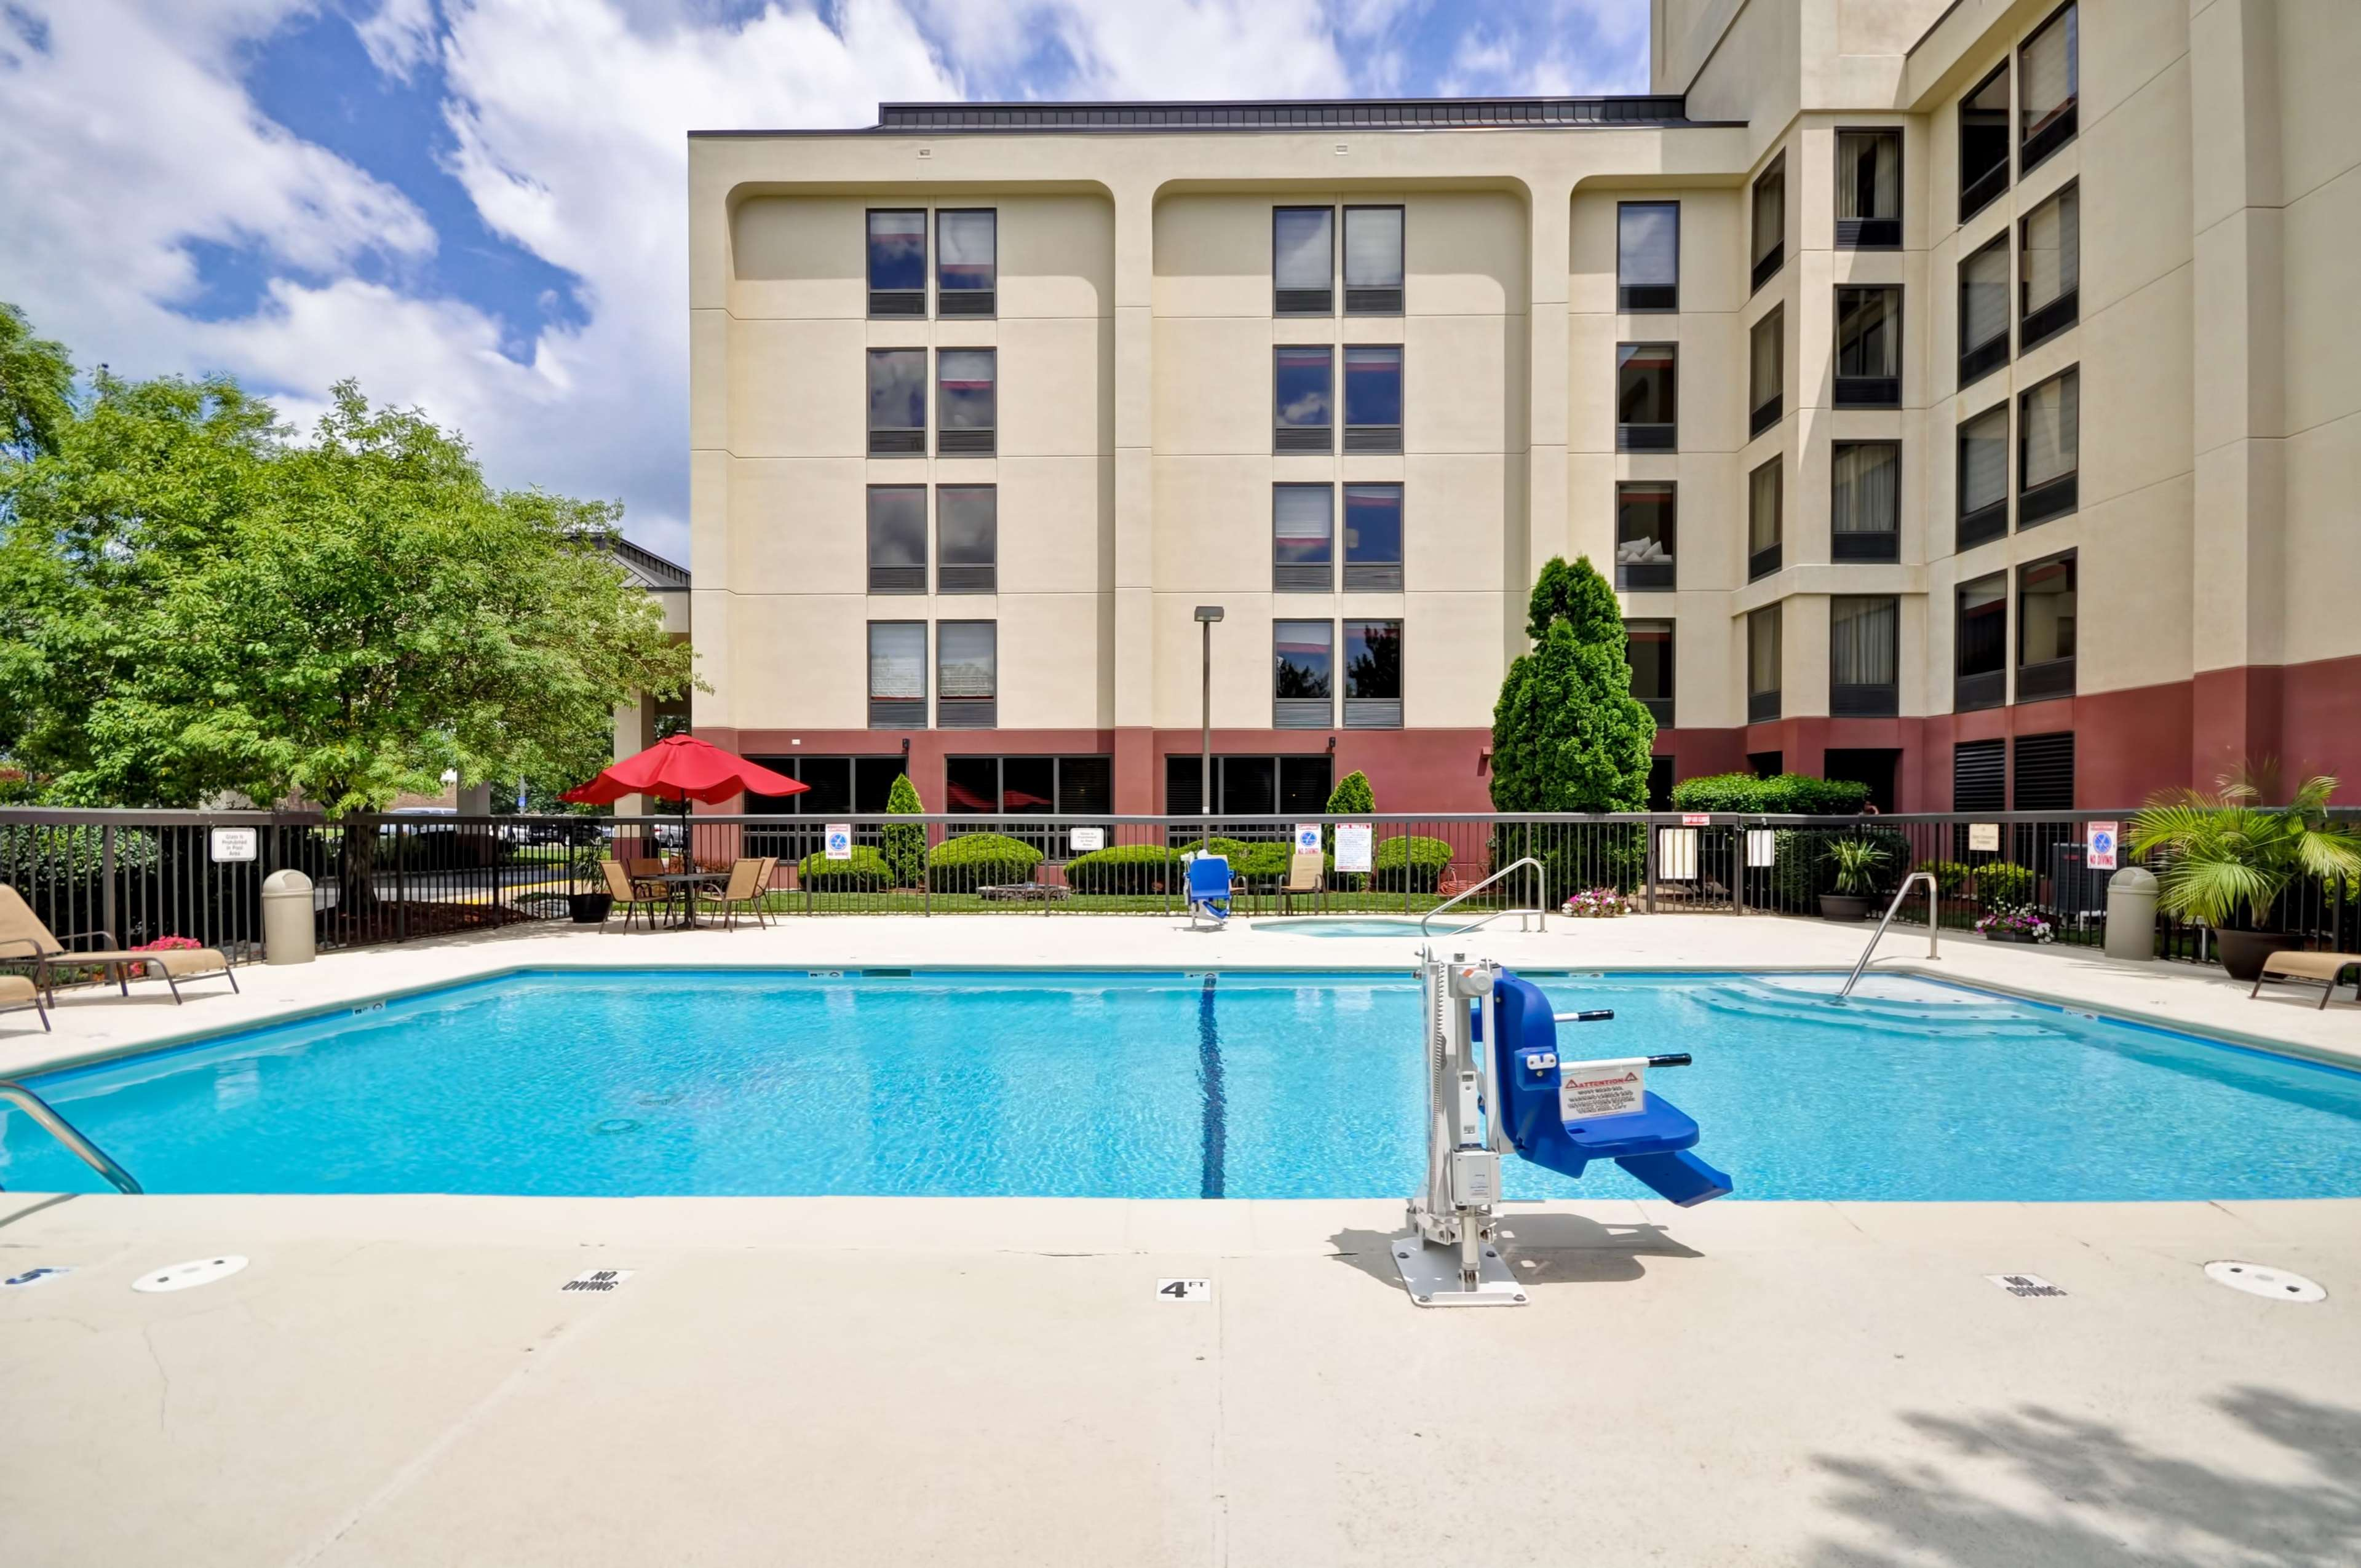 Hampton Inn Kansas City/Overland Park image 46